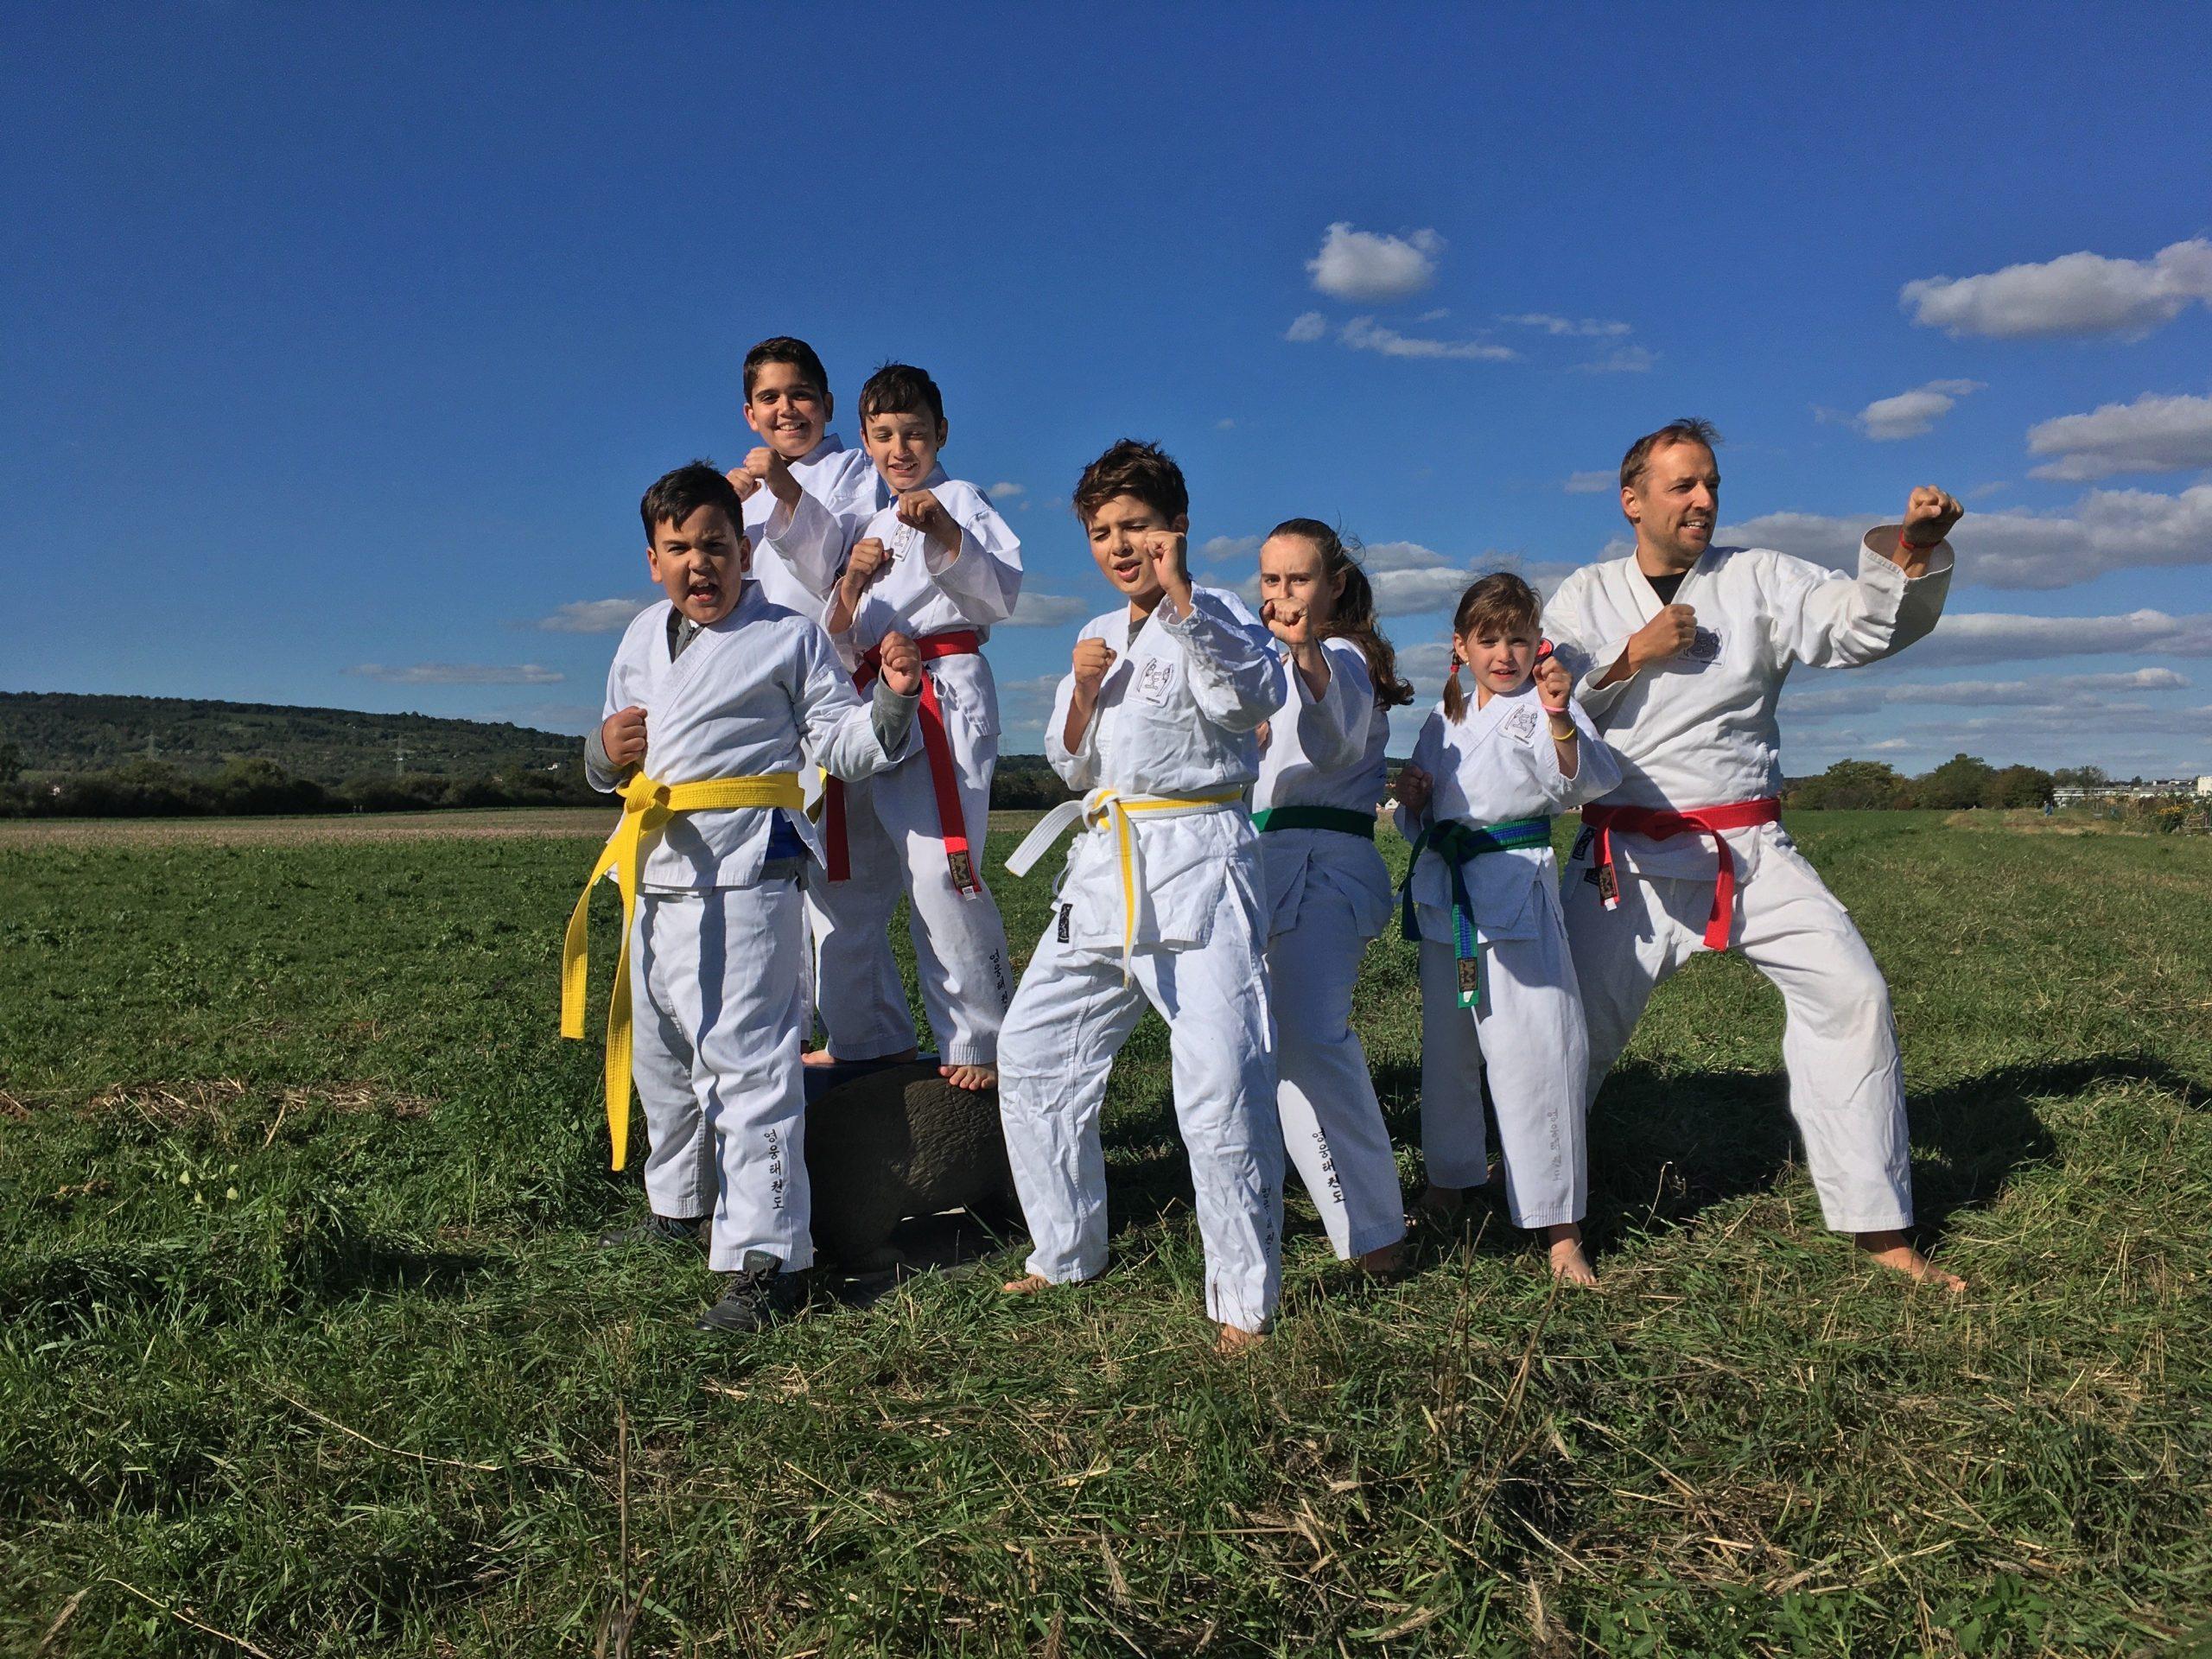 YOUNG-UNG Taekwondo Kampfsport Camp Natur Kids Training Kampfsport